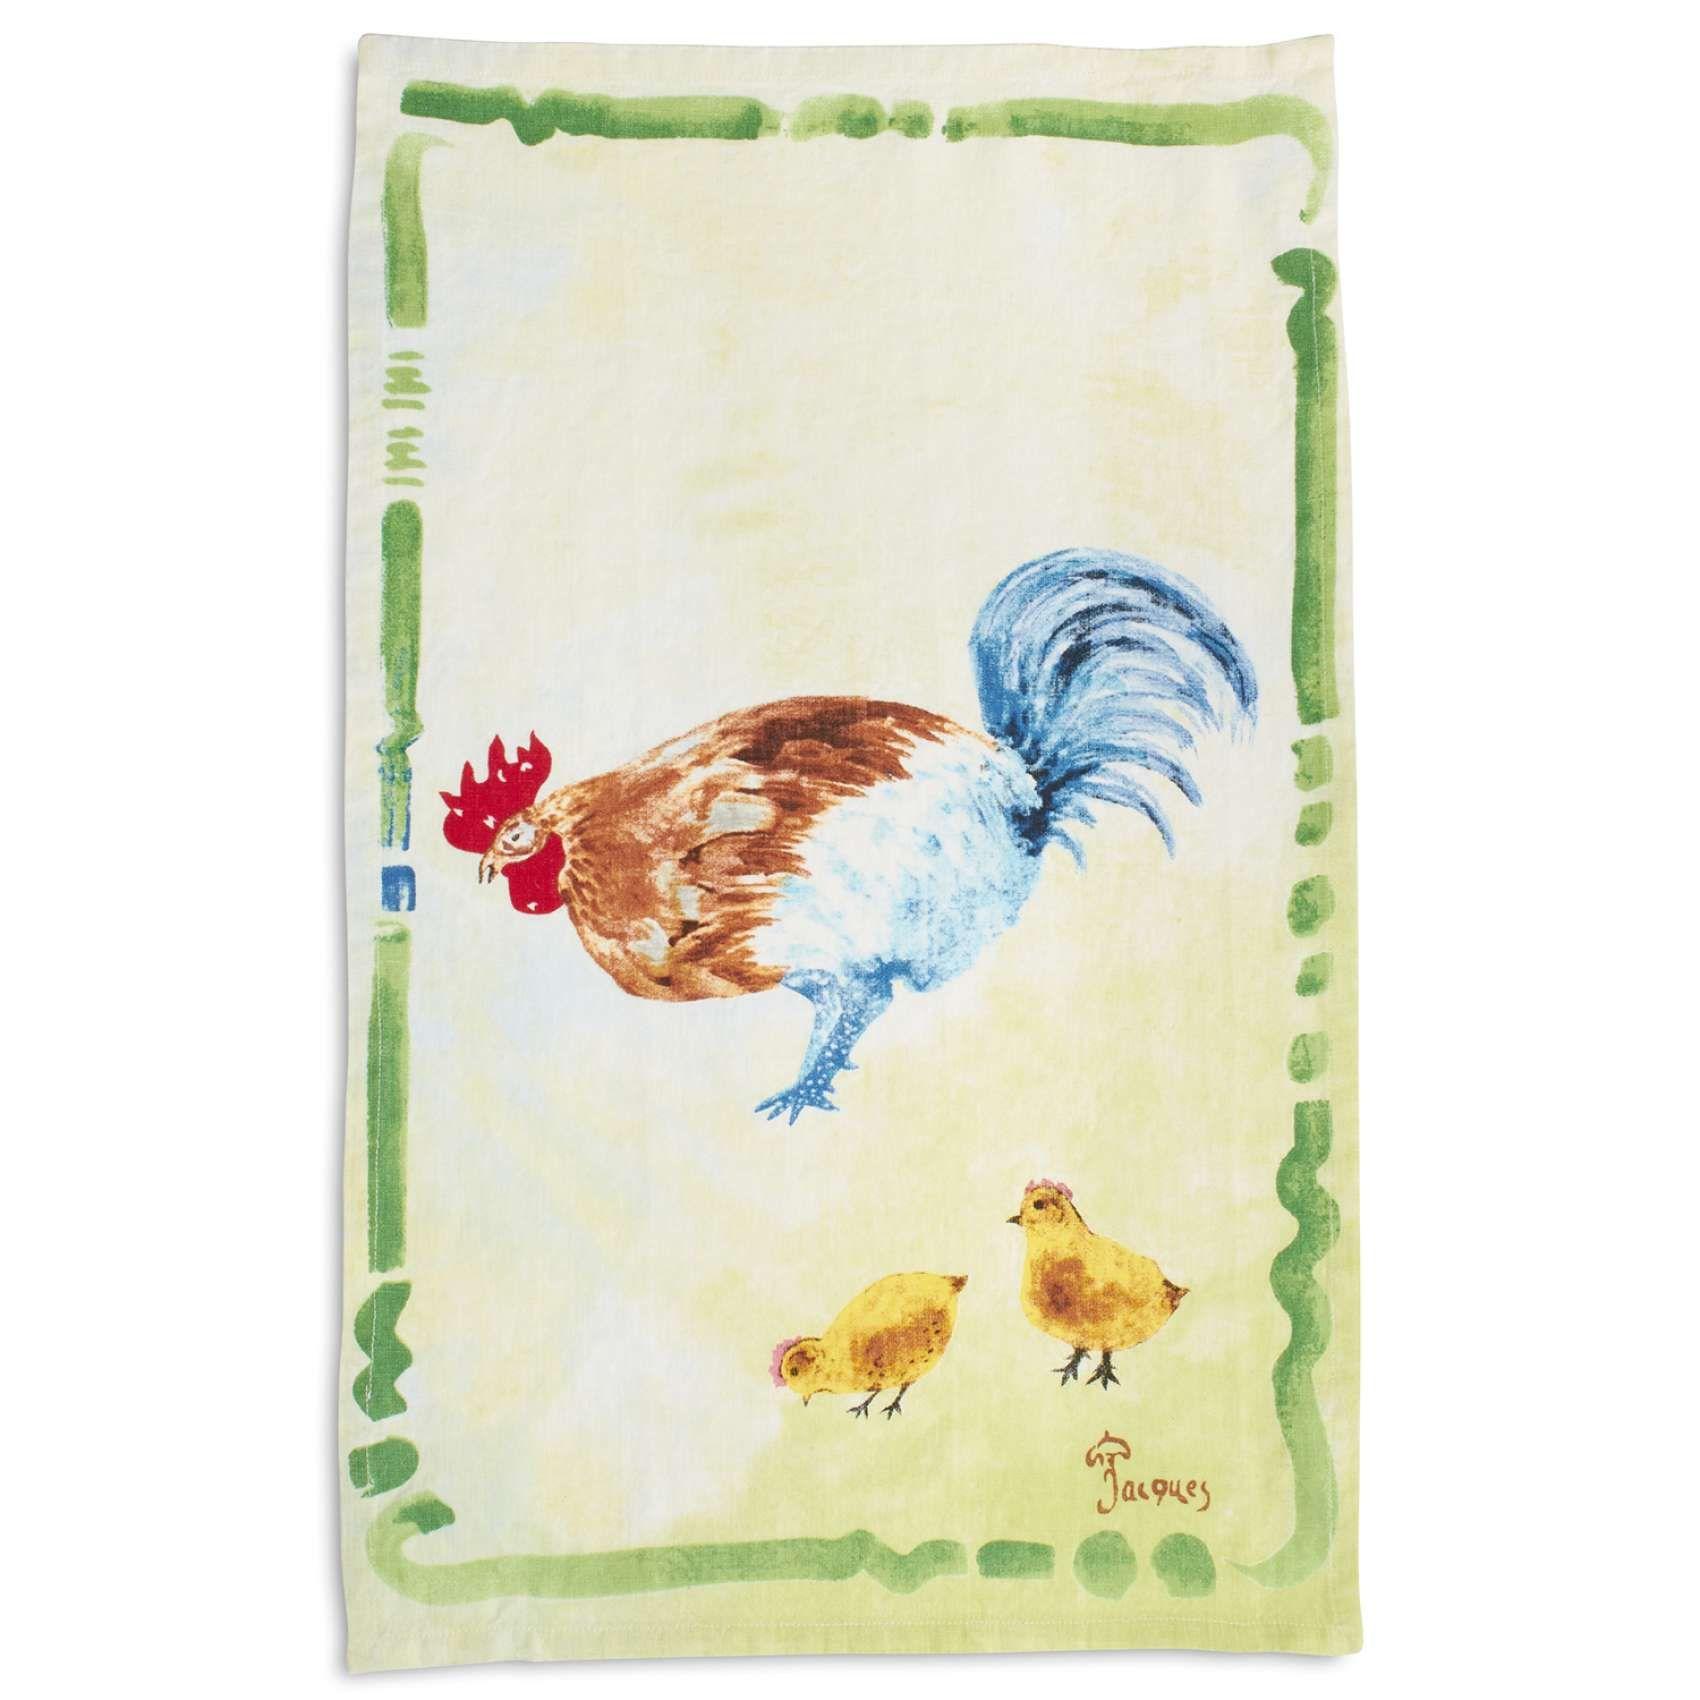 Jacques Pepin Collection Chicken With Chicks Linen Kitchen Towel 28 X 18 Sur La Table Linen Kitchen Towels Kitchen Towels Sur La Table